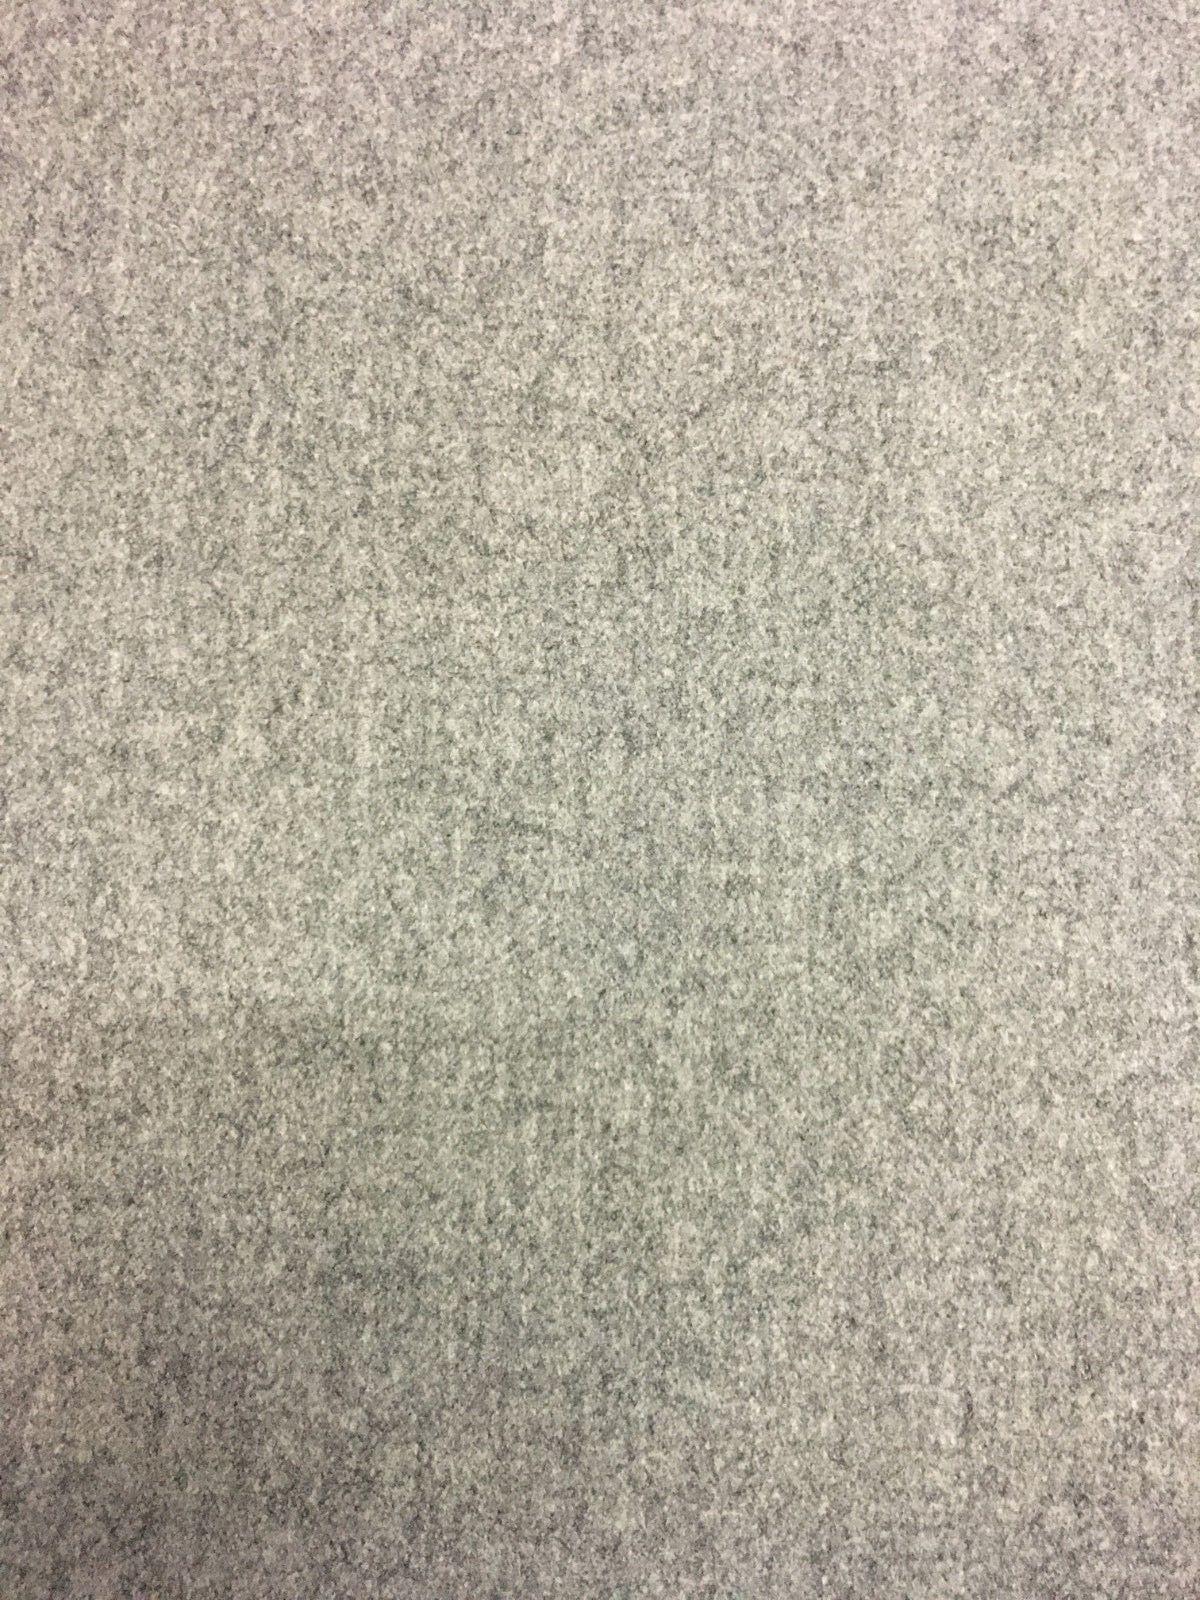 Mid Century Modern Wool Upholstery Fabric Medium Gray Melange 4.75 yds GQ